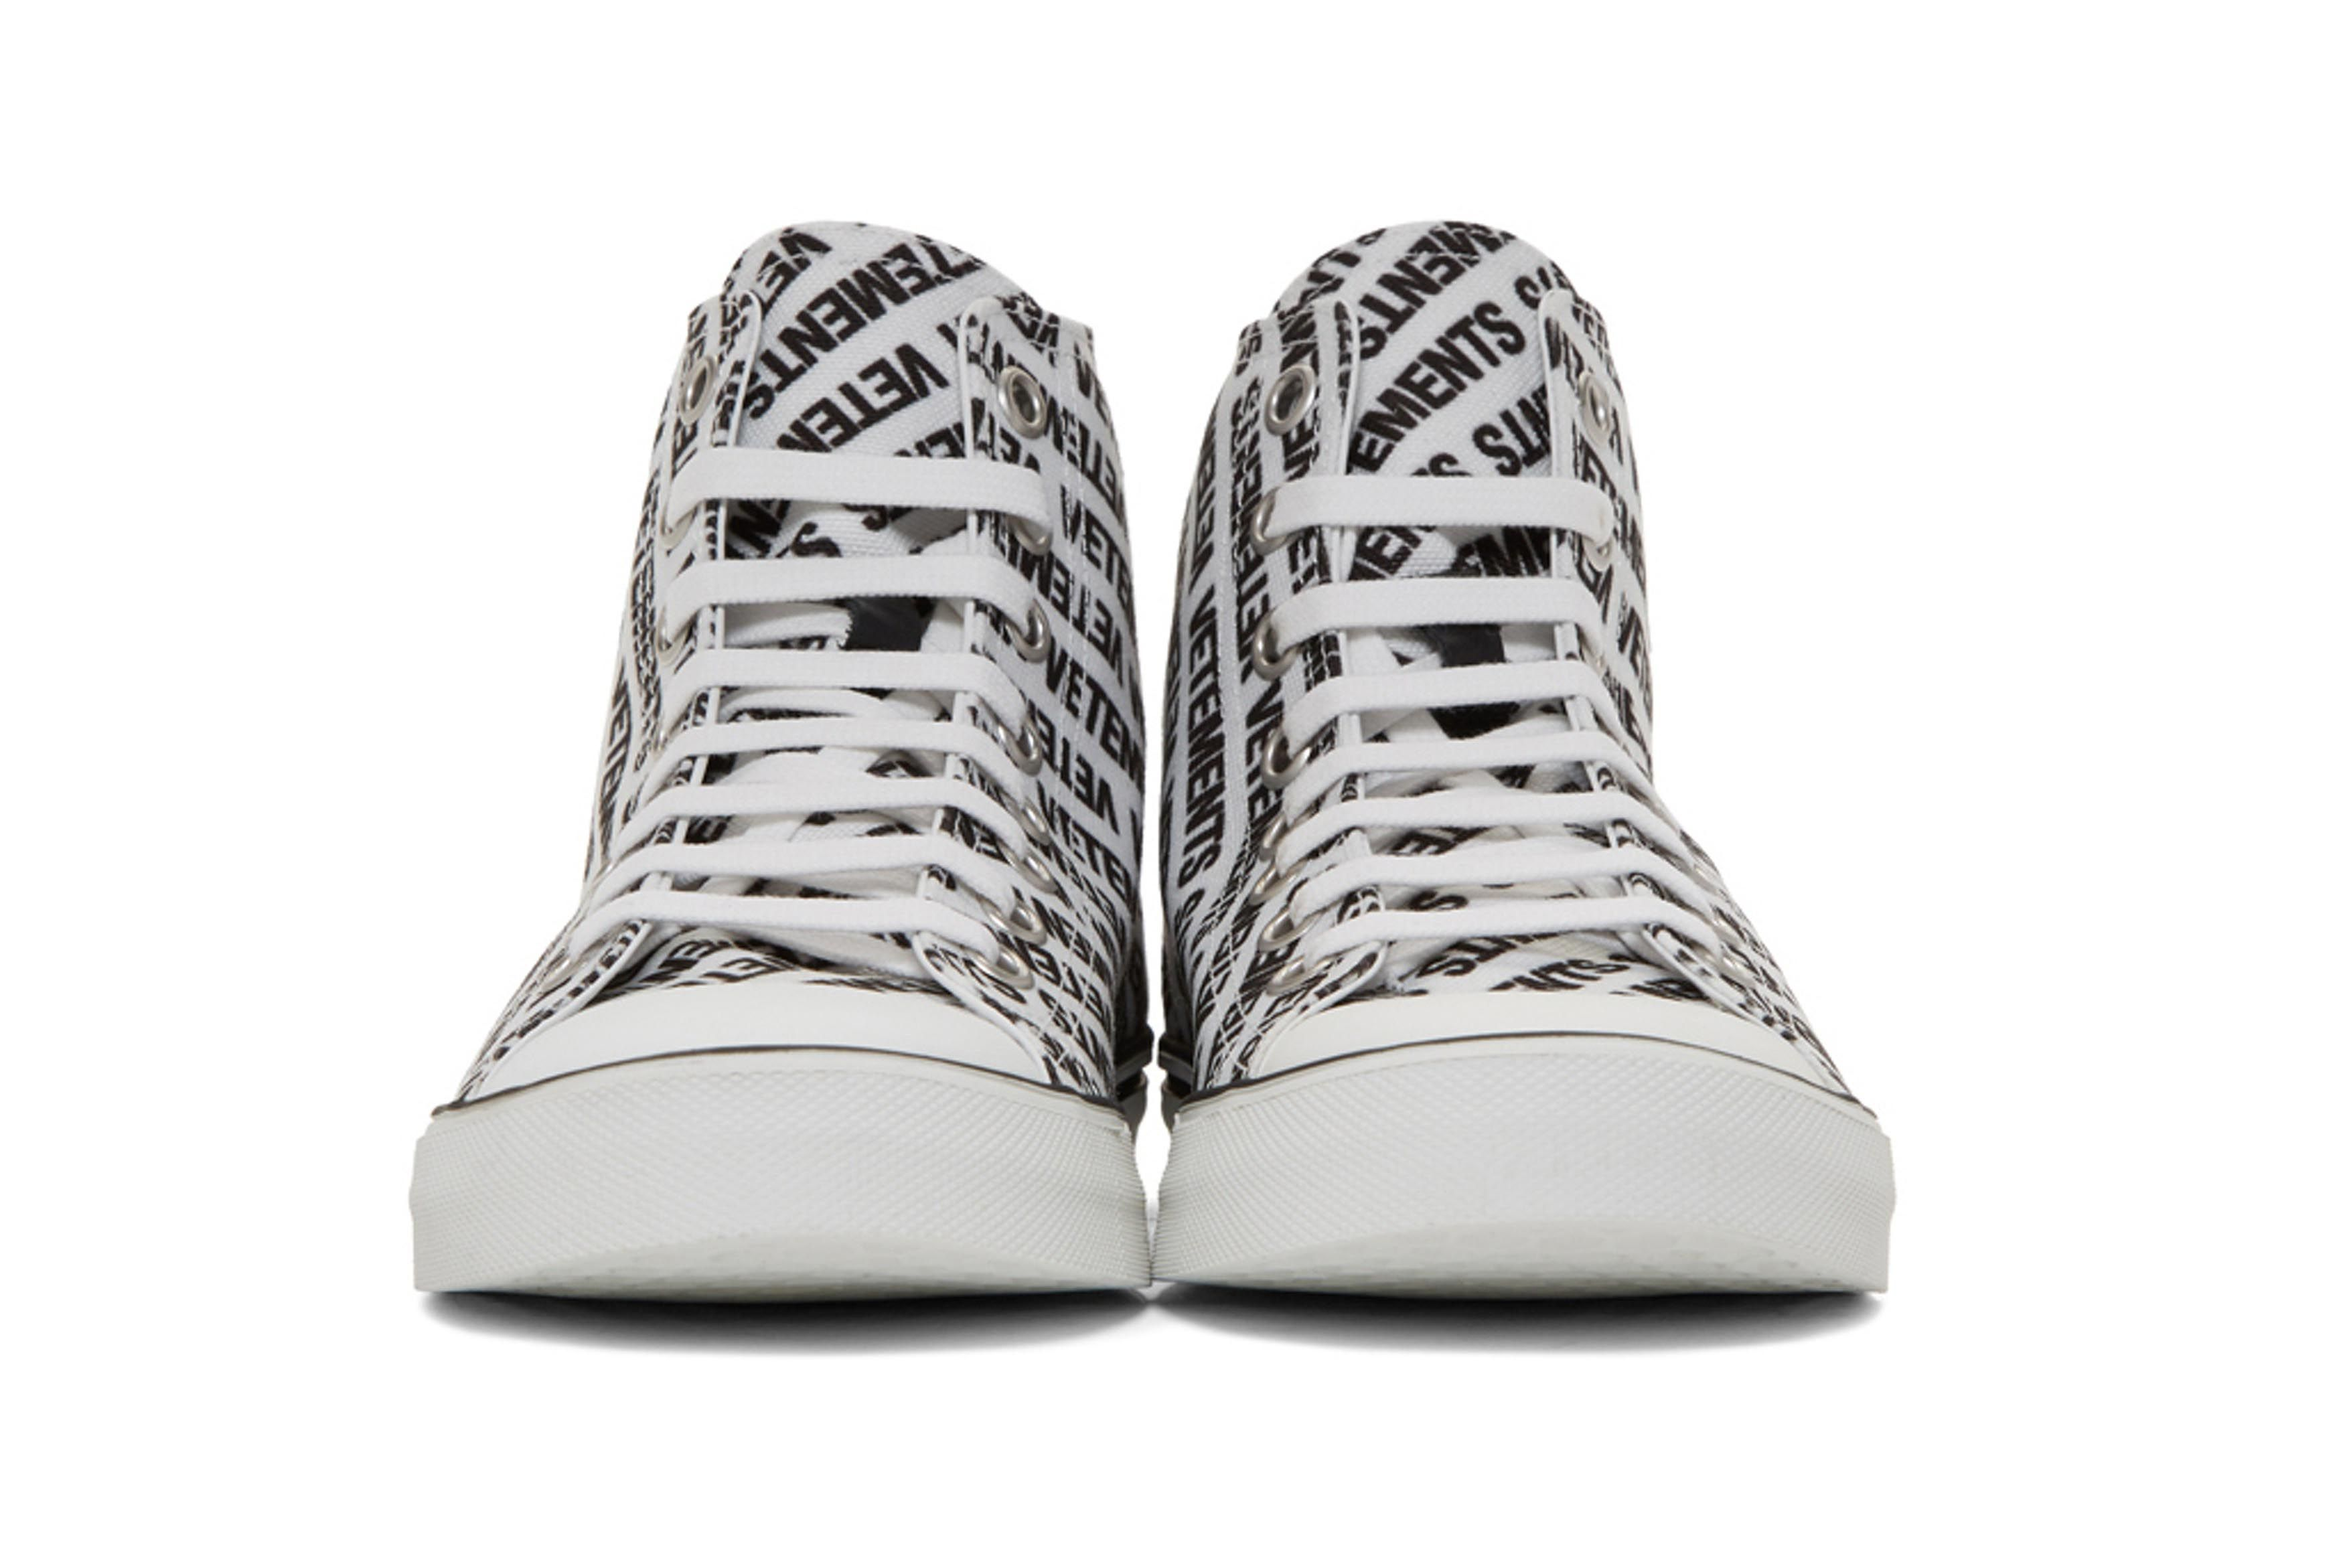 Vetements Logo High Top Sneakers Black White 2 Sneaker Freaker